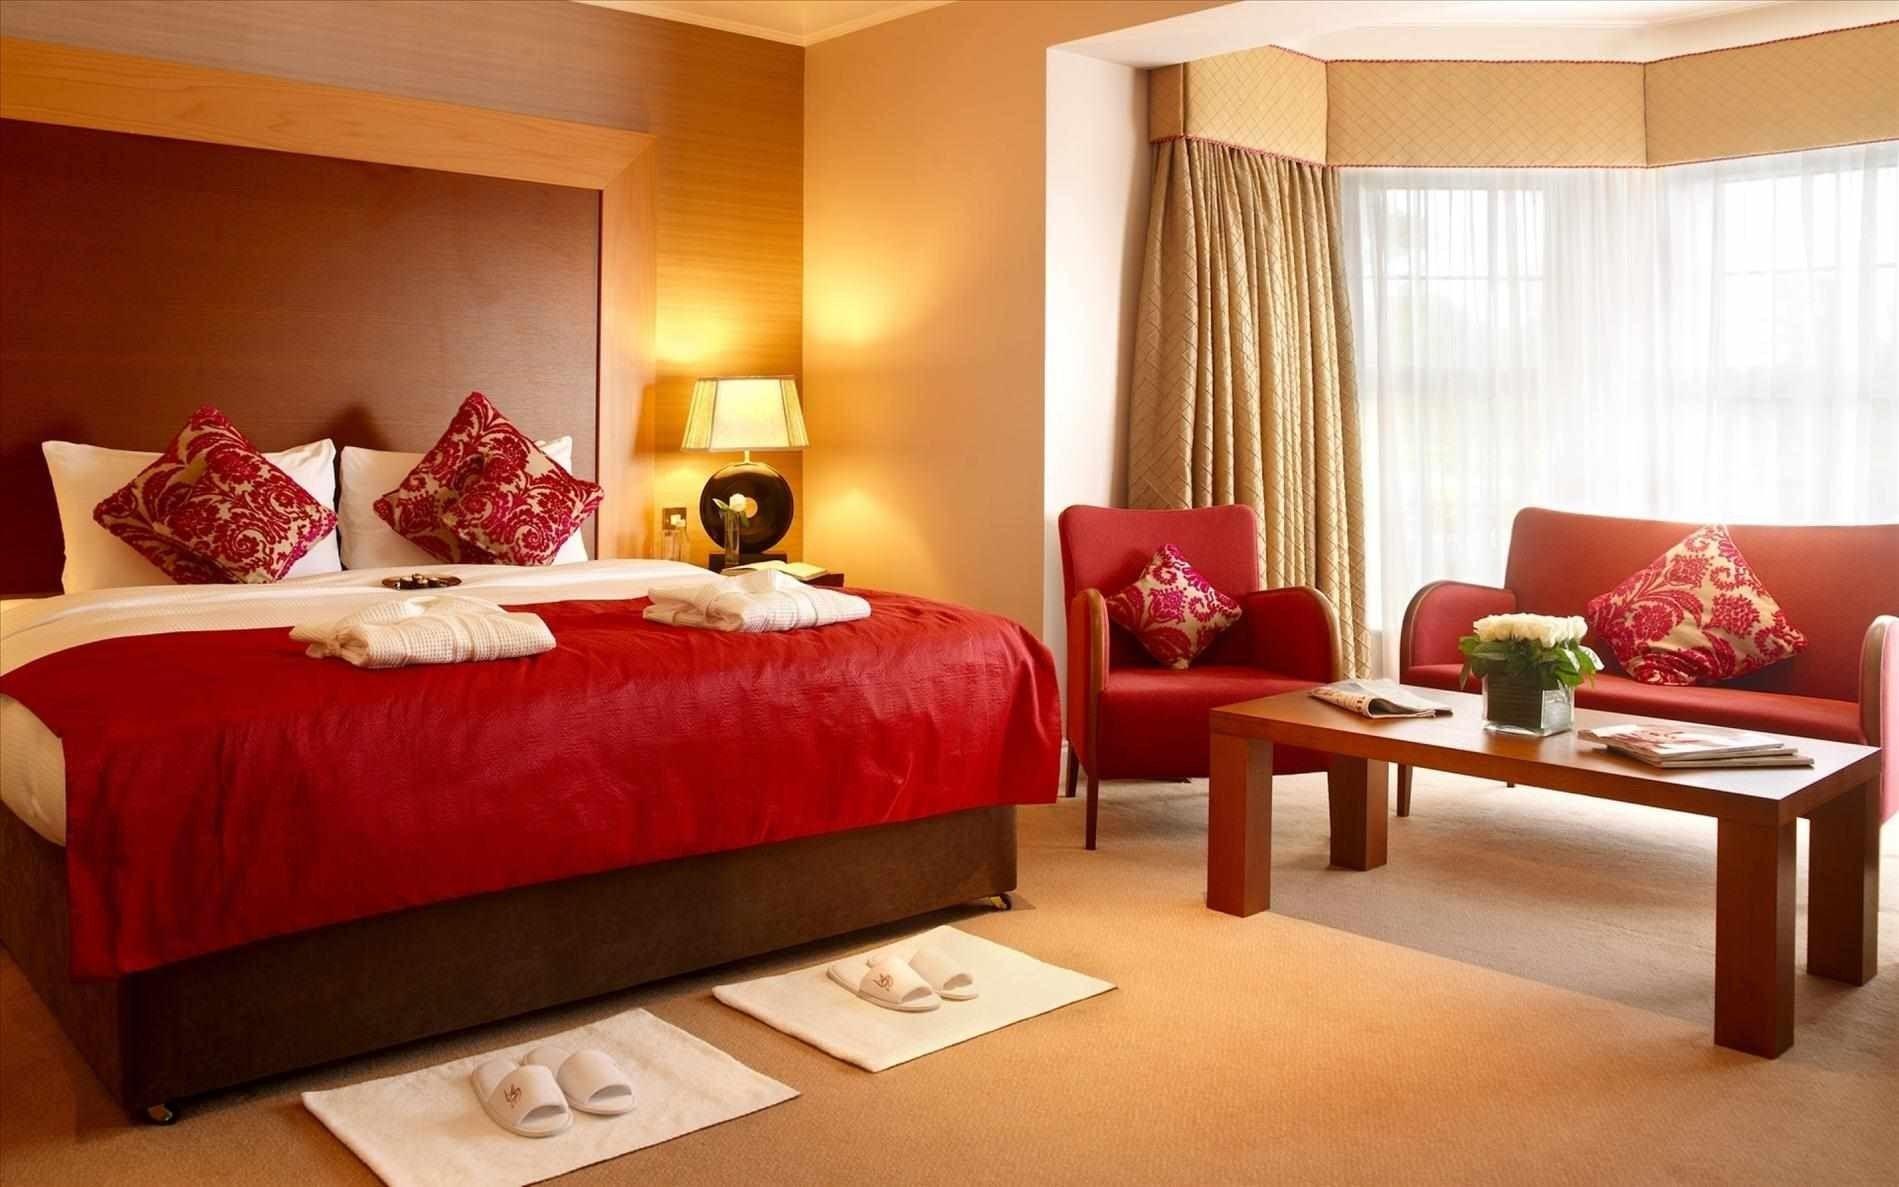 50+ Cozy and Romantic Bedroom Ideas | Best bedroom paint ...